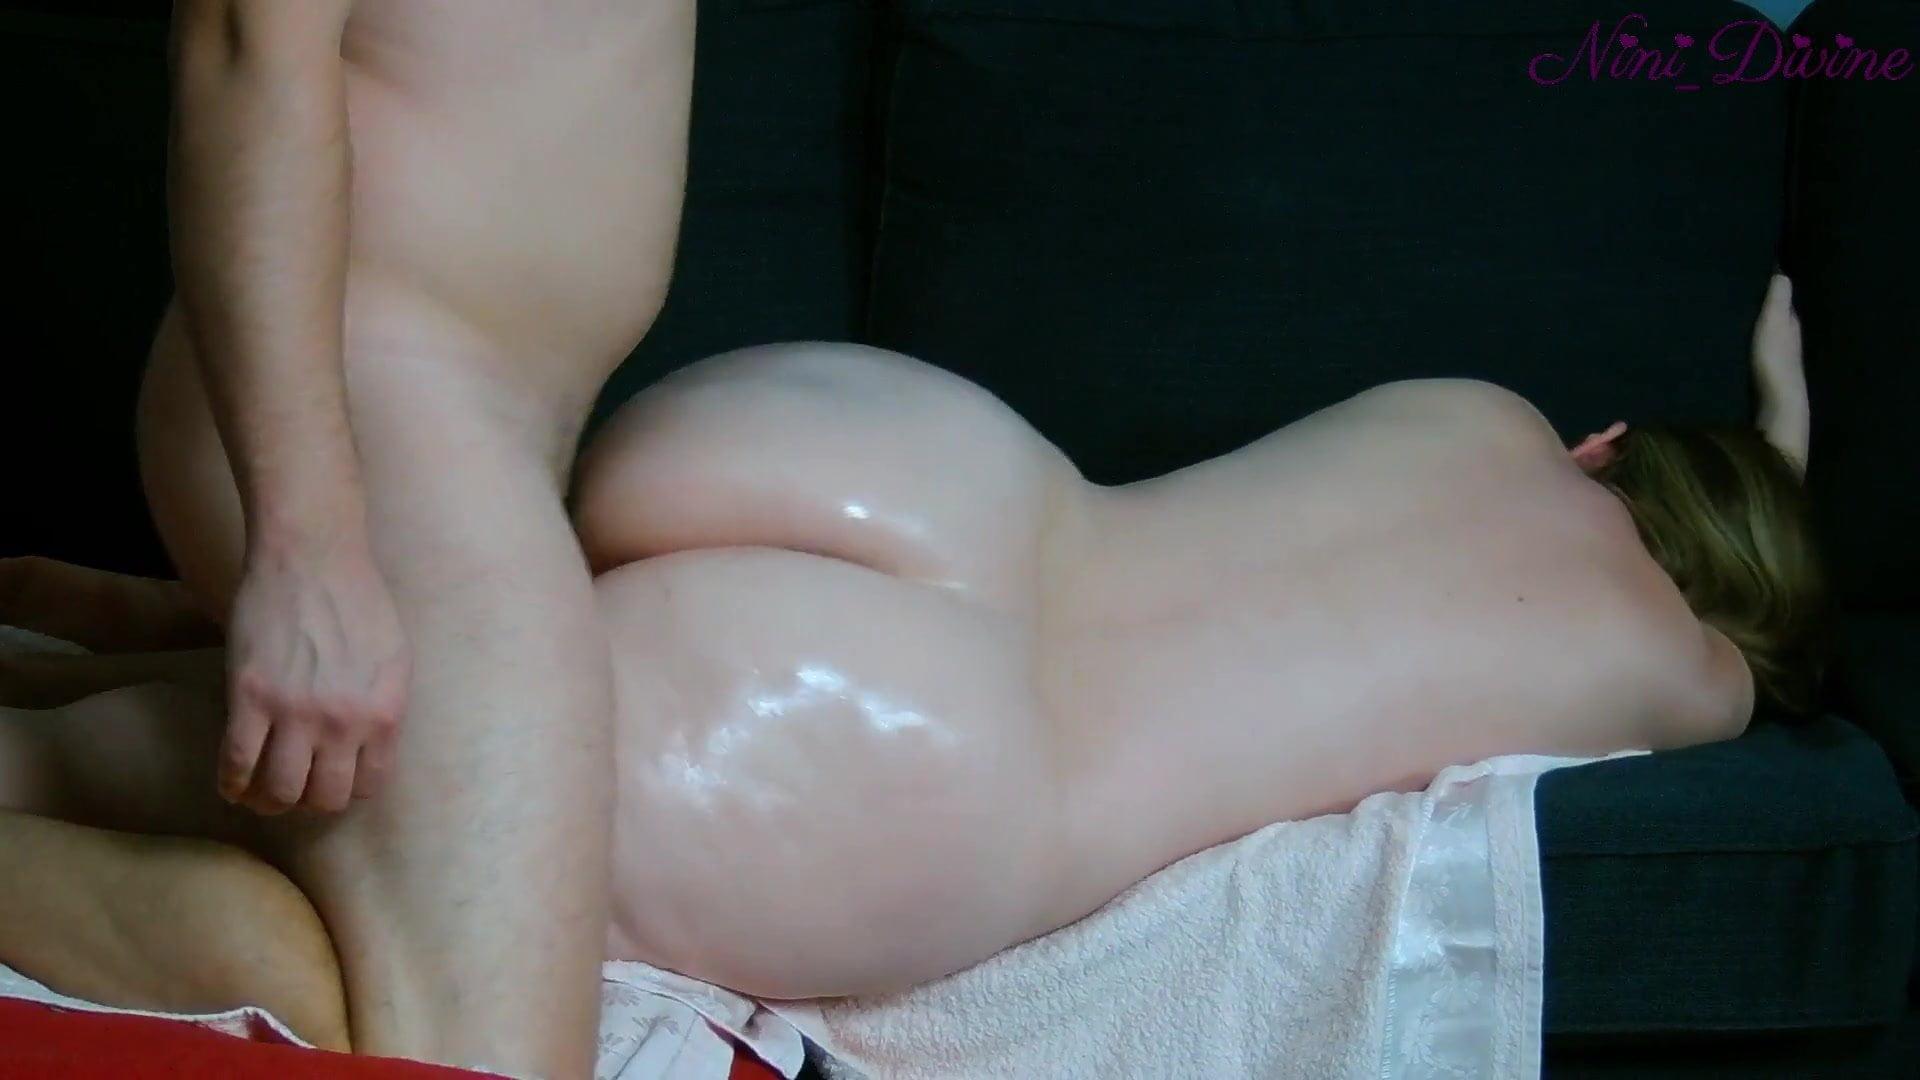 Omg thats a big dick